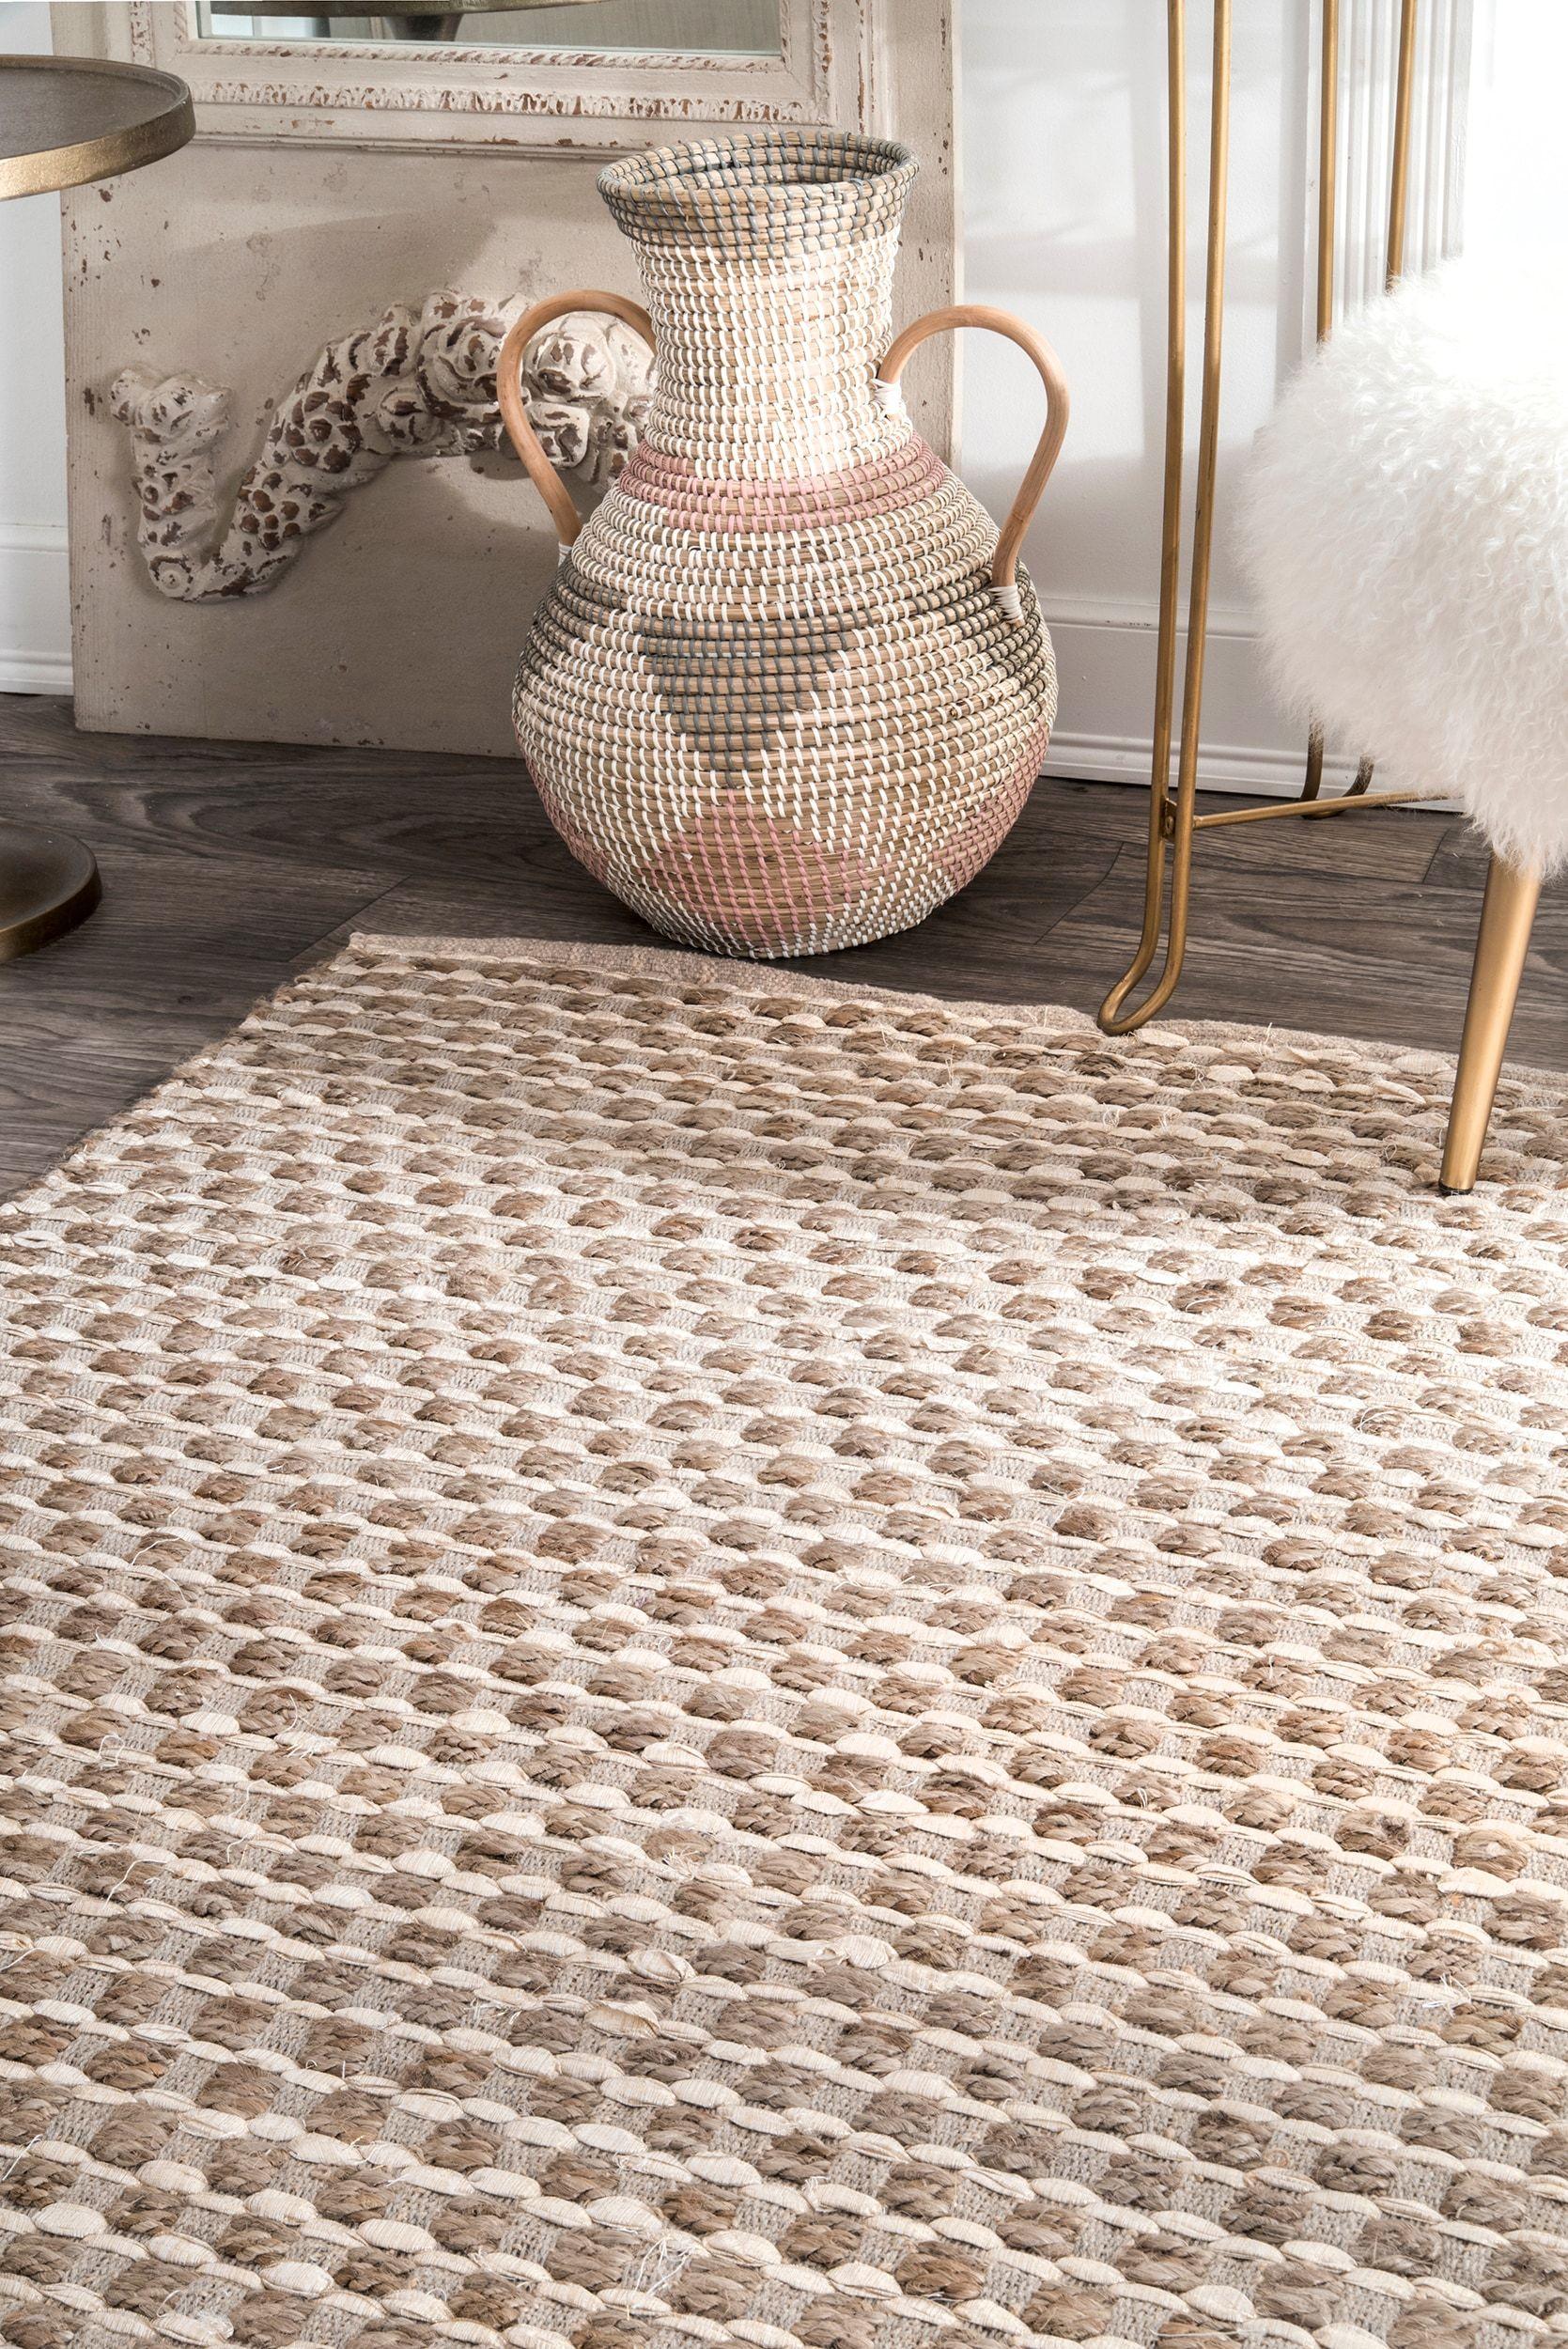 Rugs USA Posada Textured Basketweave RUG (With images